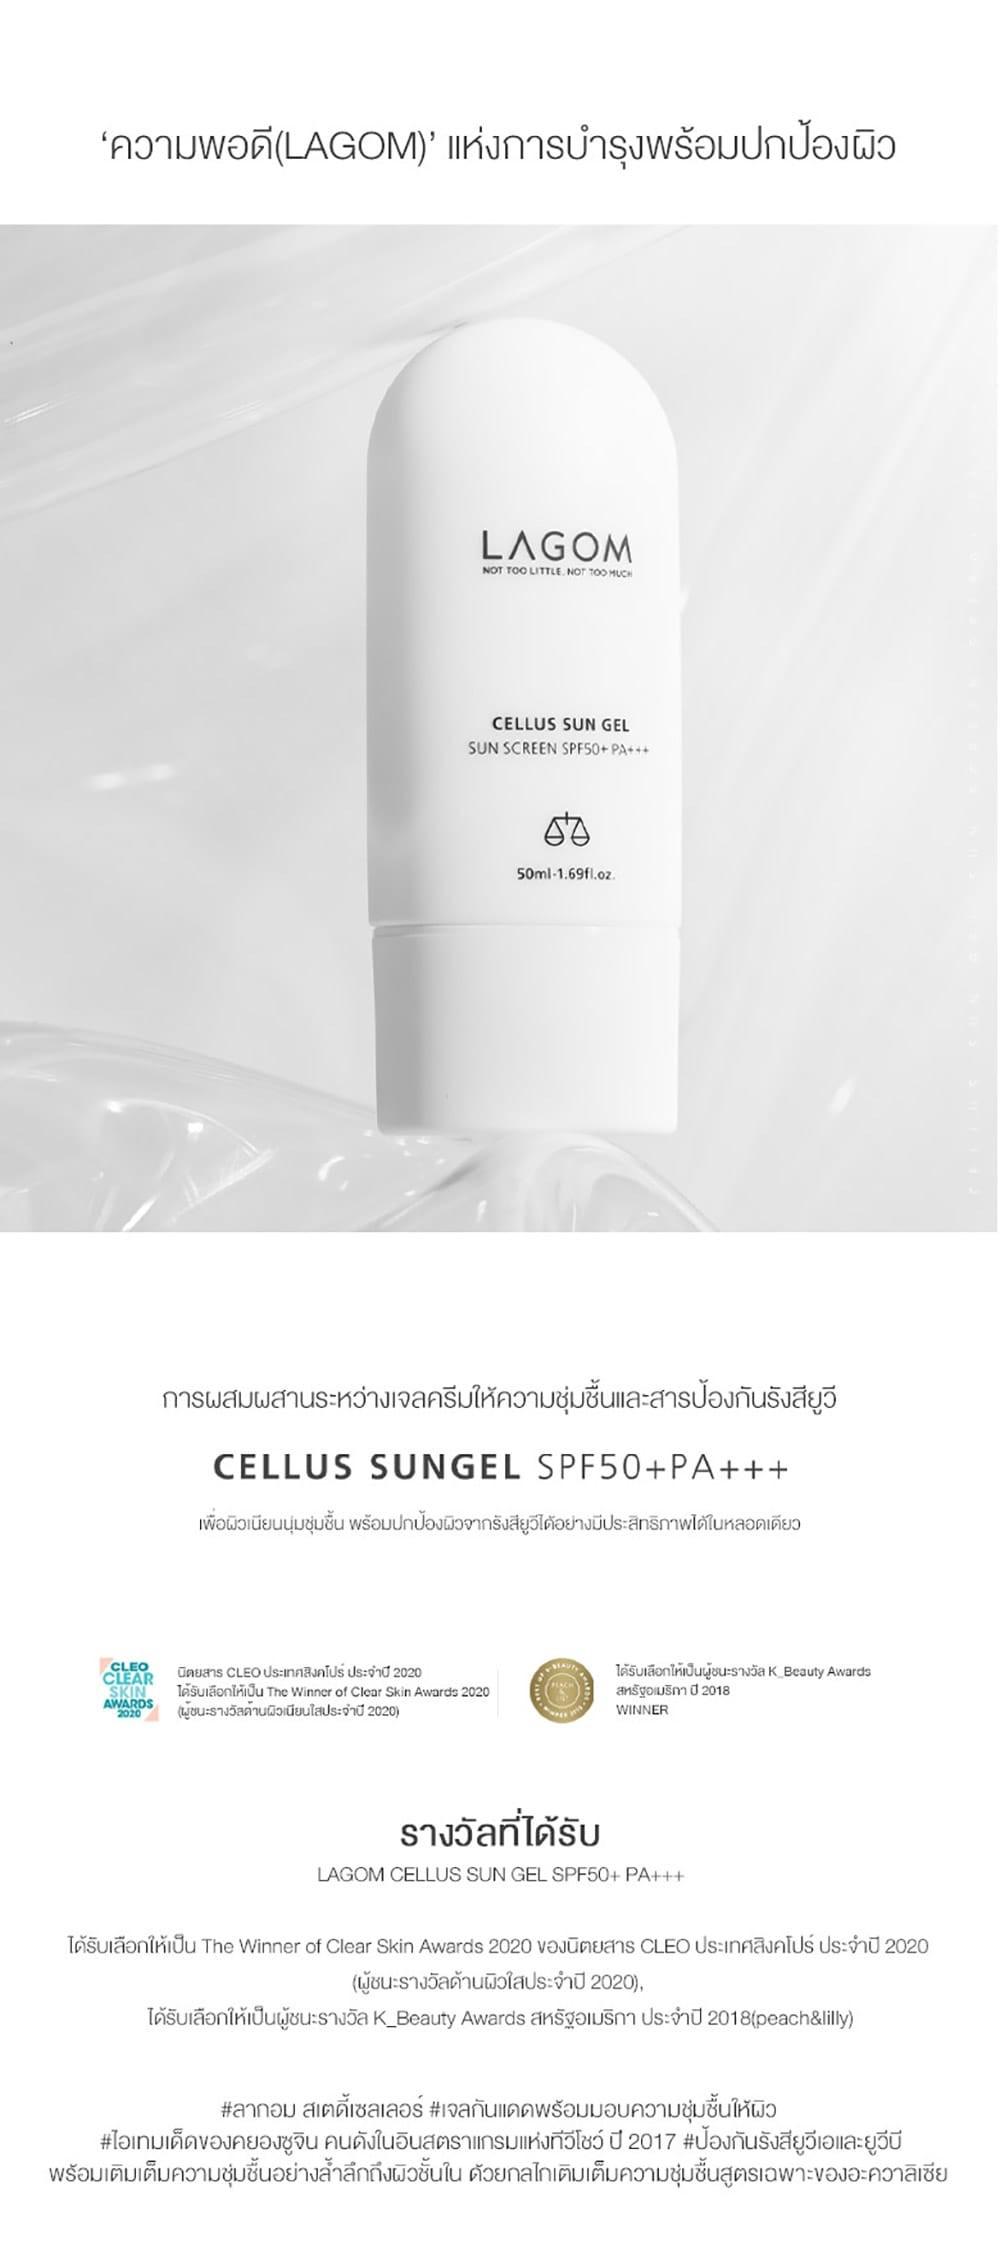 2-lagom-cellus-sun-gel.jpg